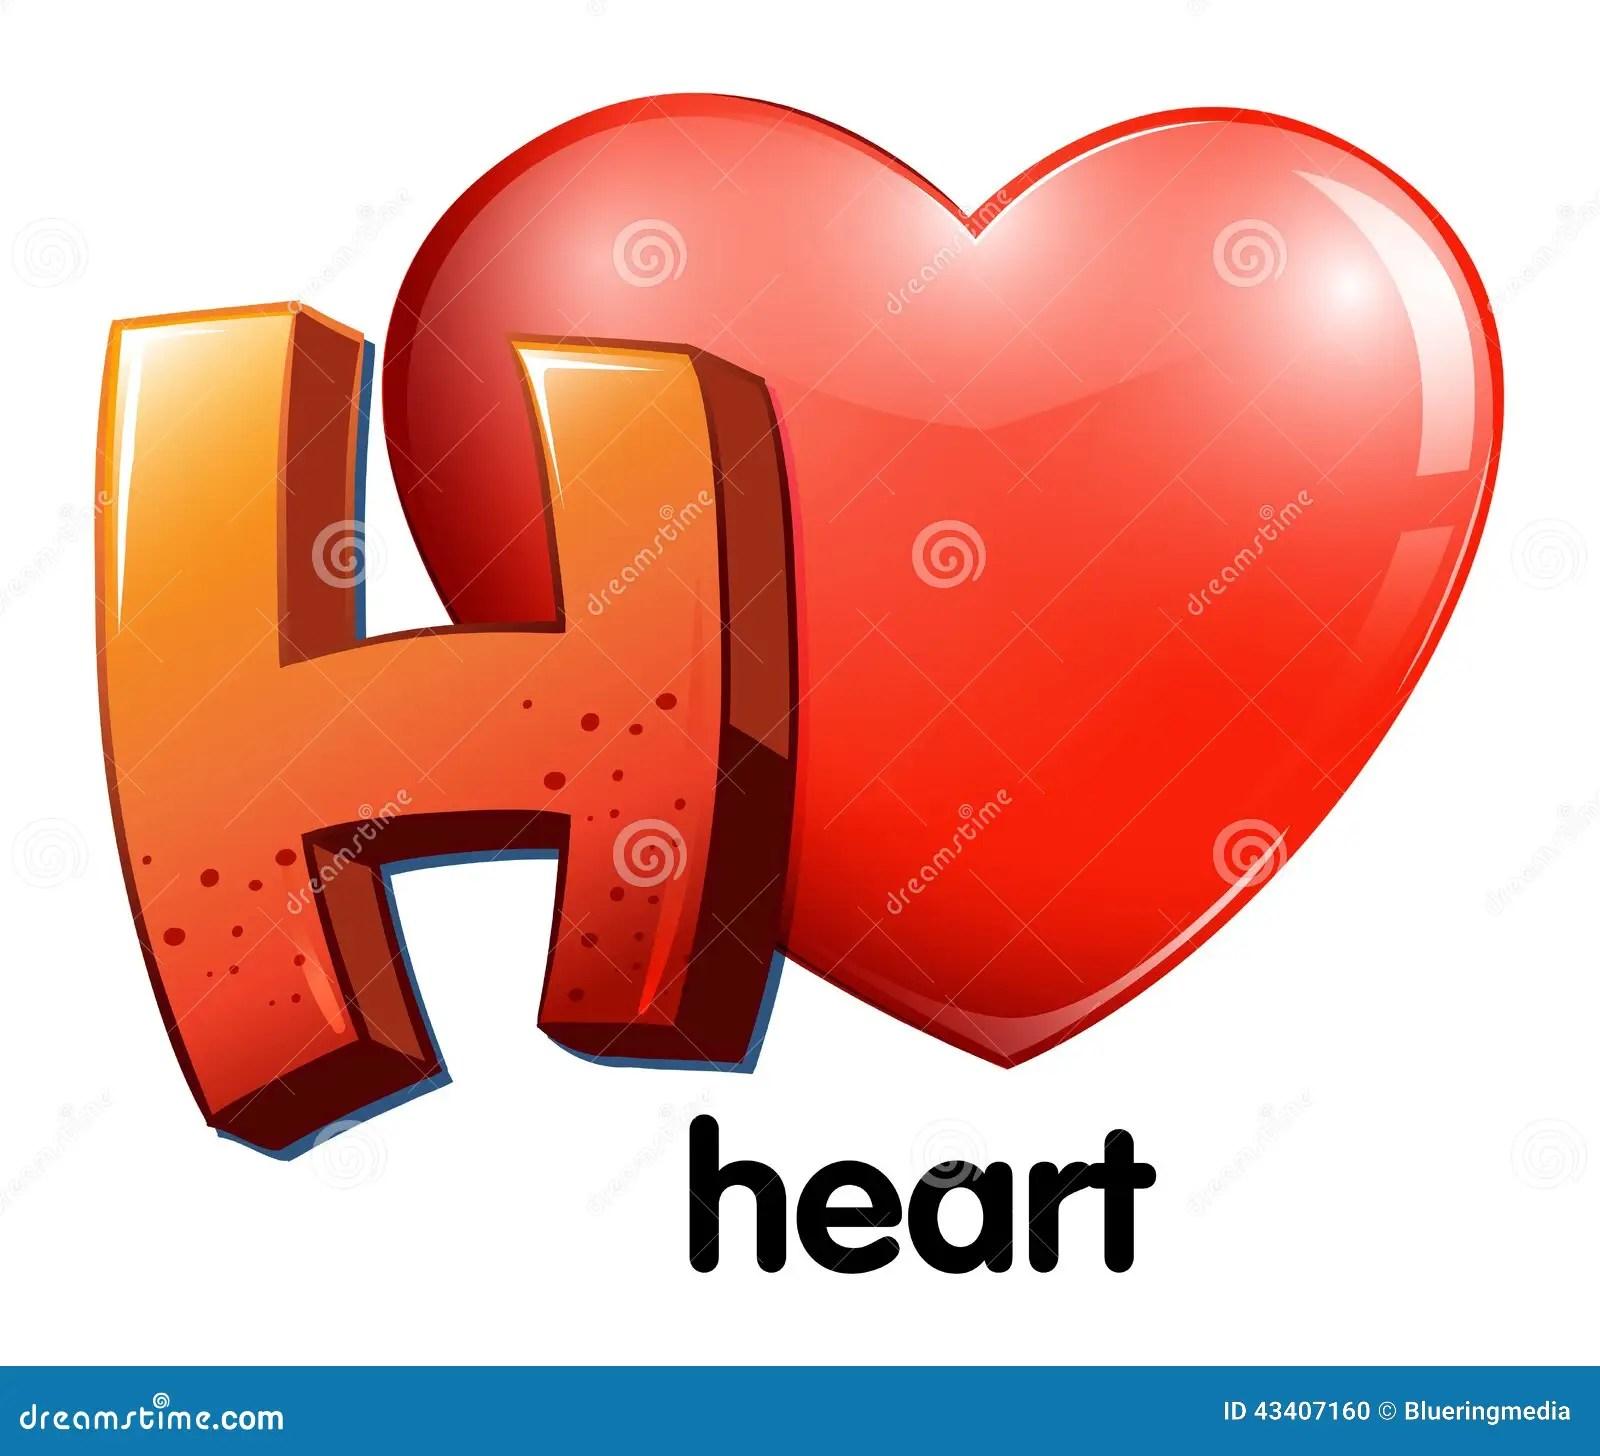 A Letter H For Heart Stock Vector Illustration Of